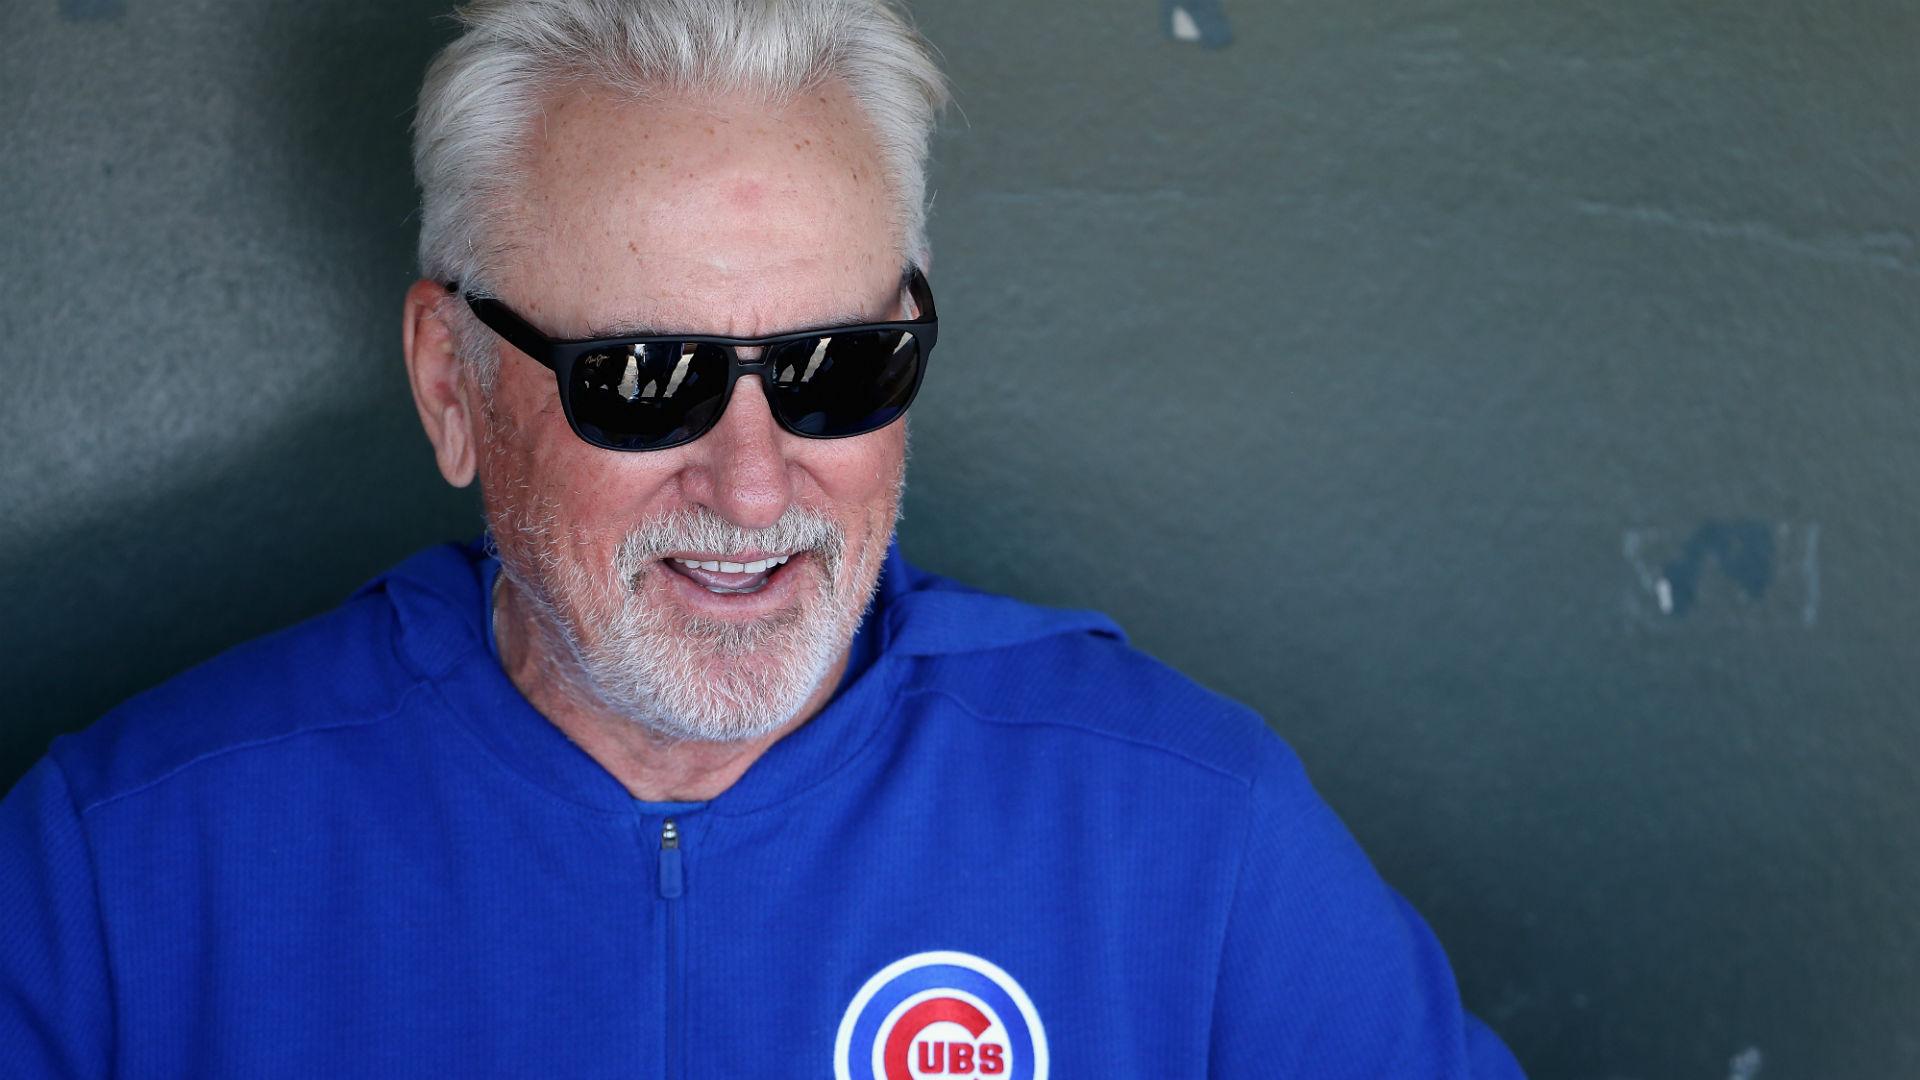 Cubs feel 'pretty fortunate' to sign Jonathan Lucroy, says Joe Maddon